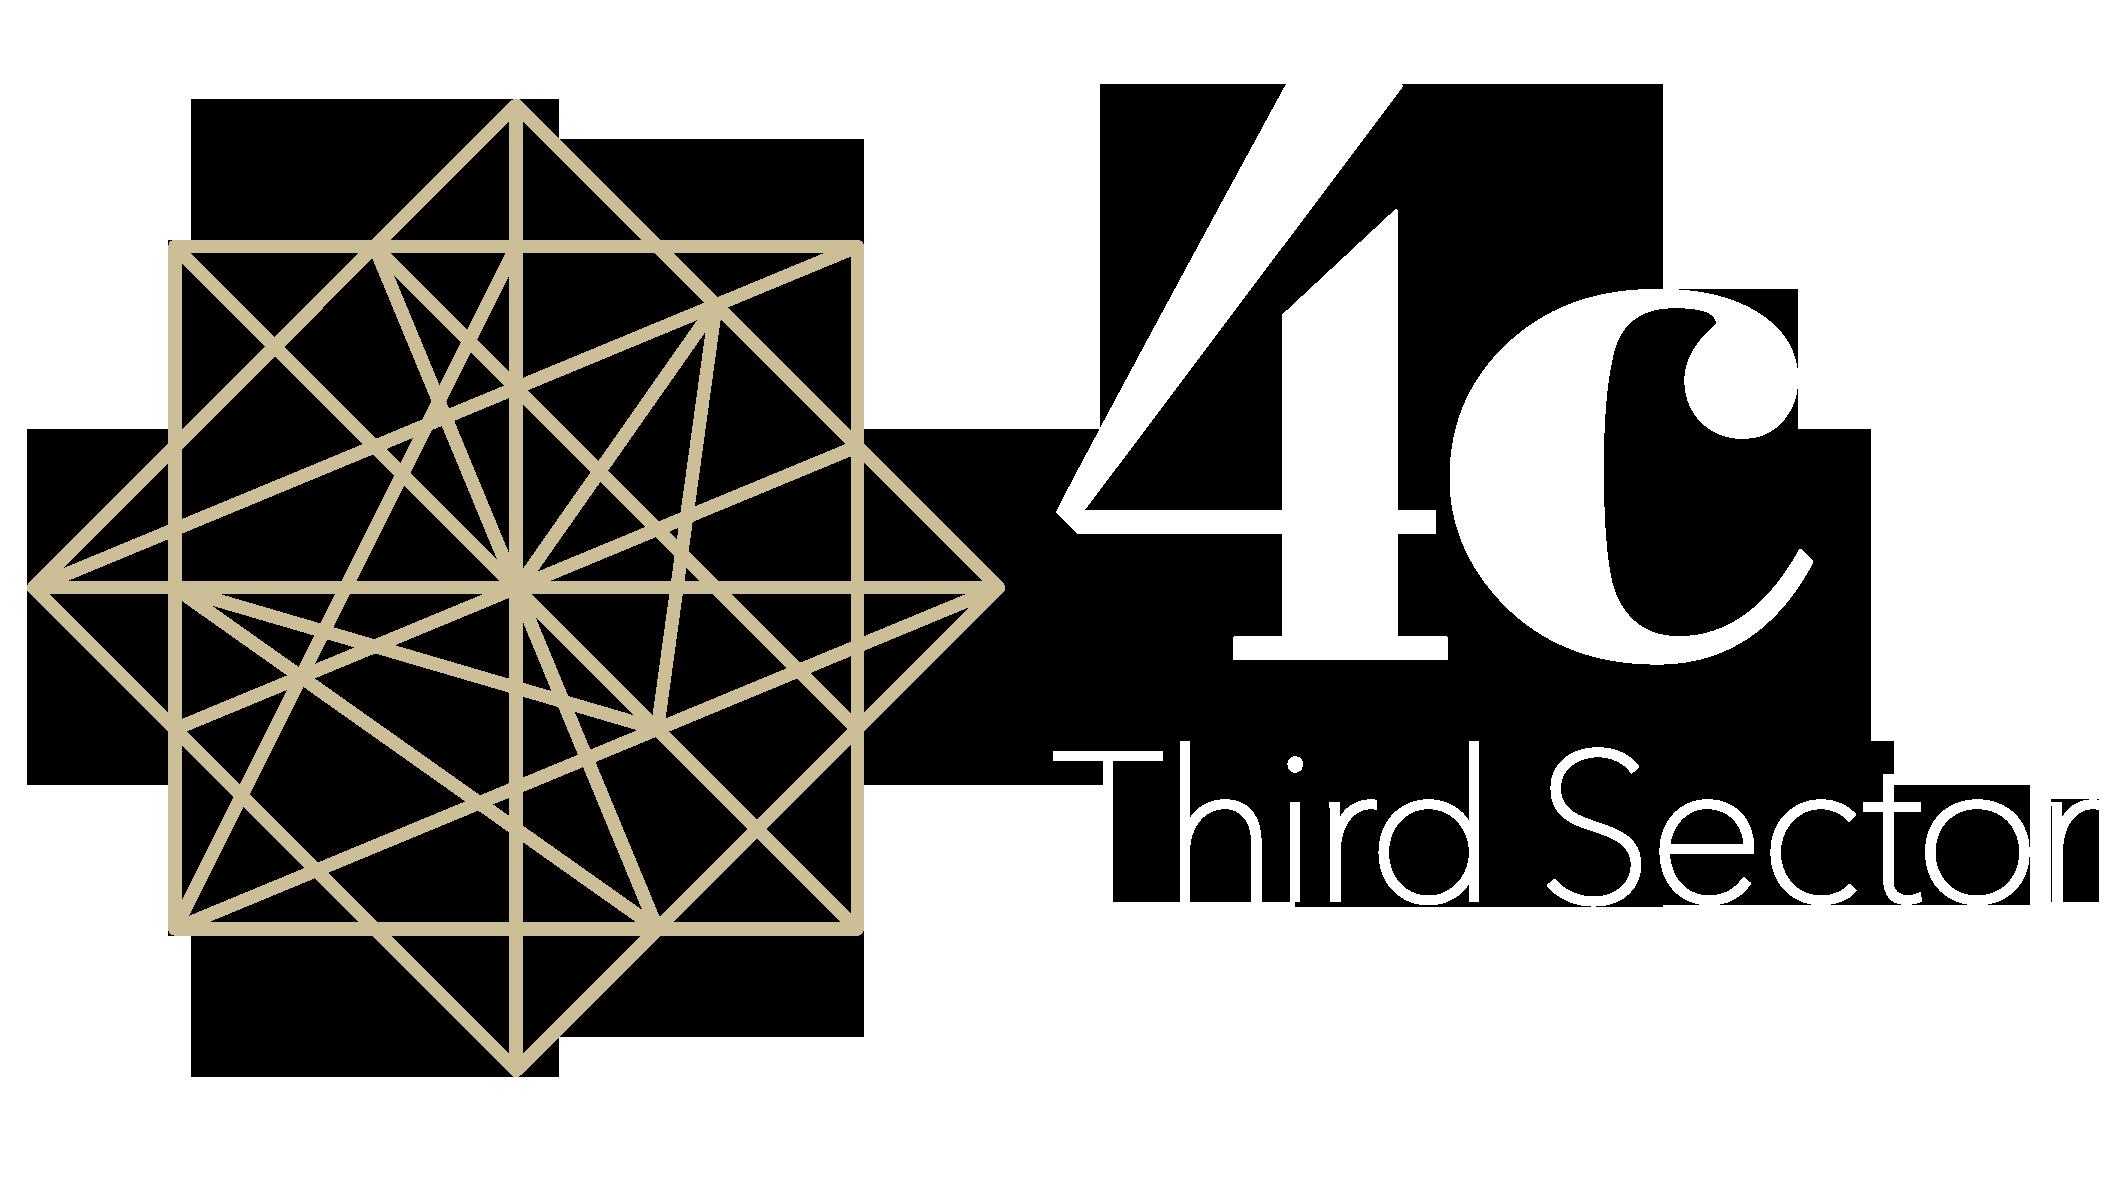 4c-third-sector